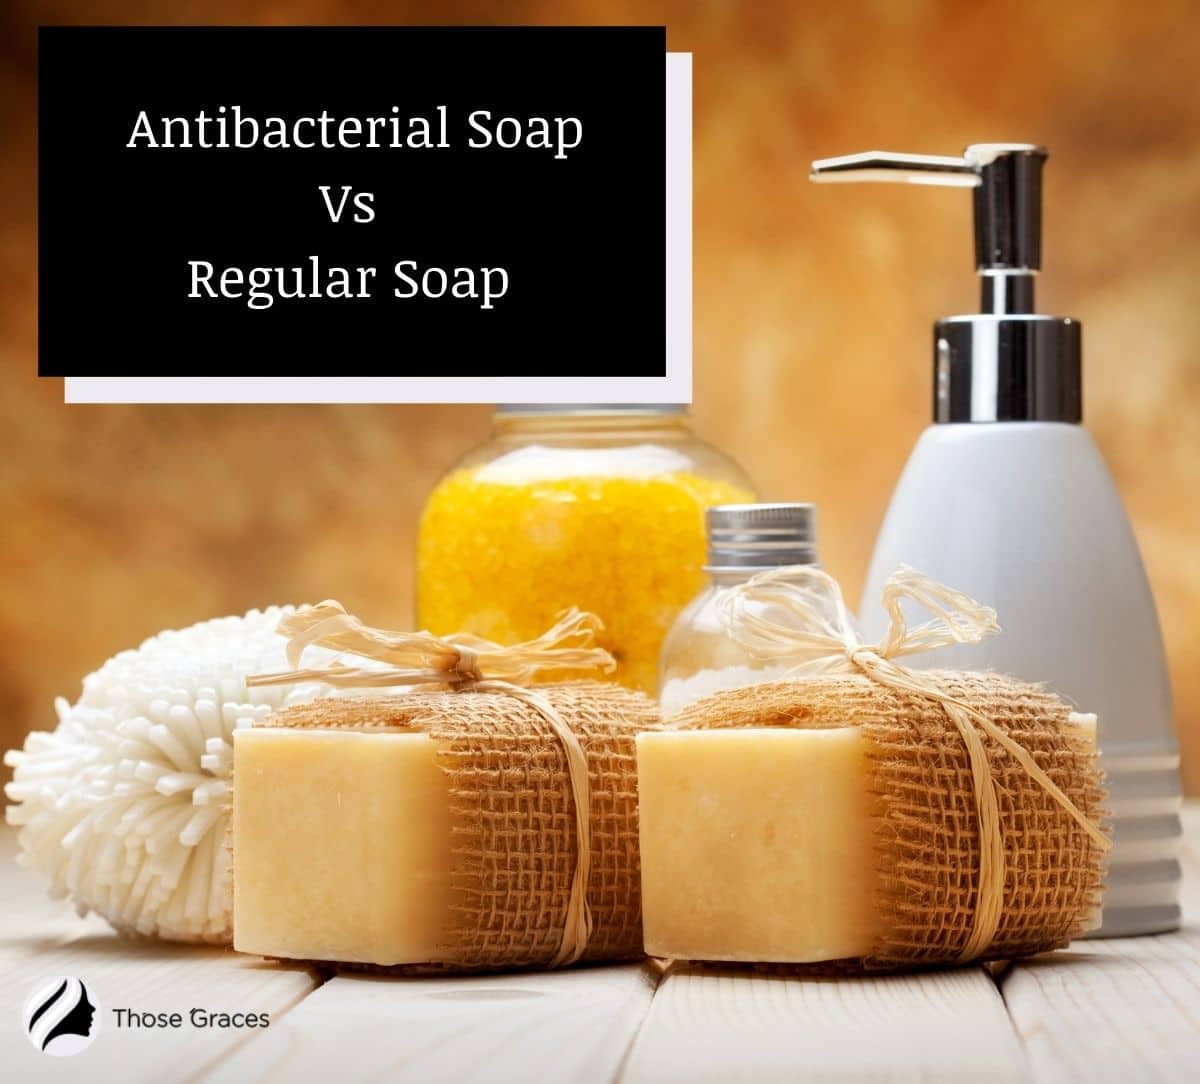 soaps on the table (antibacterial soap vs regular soap)